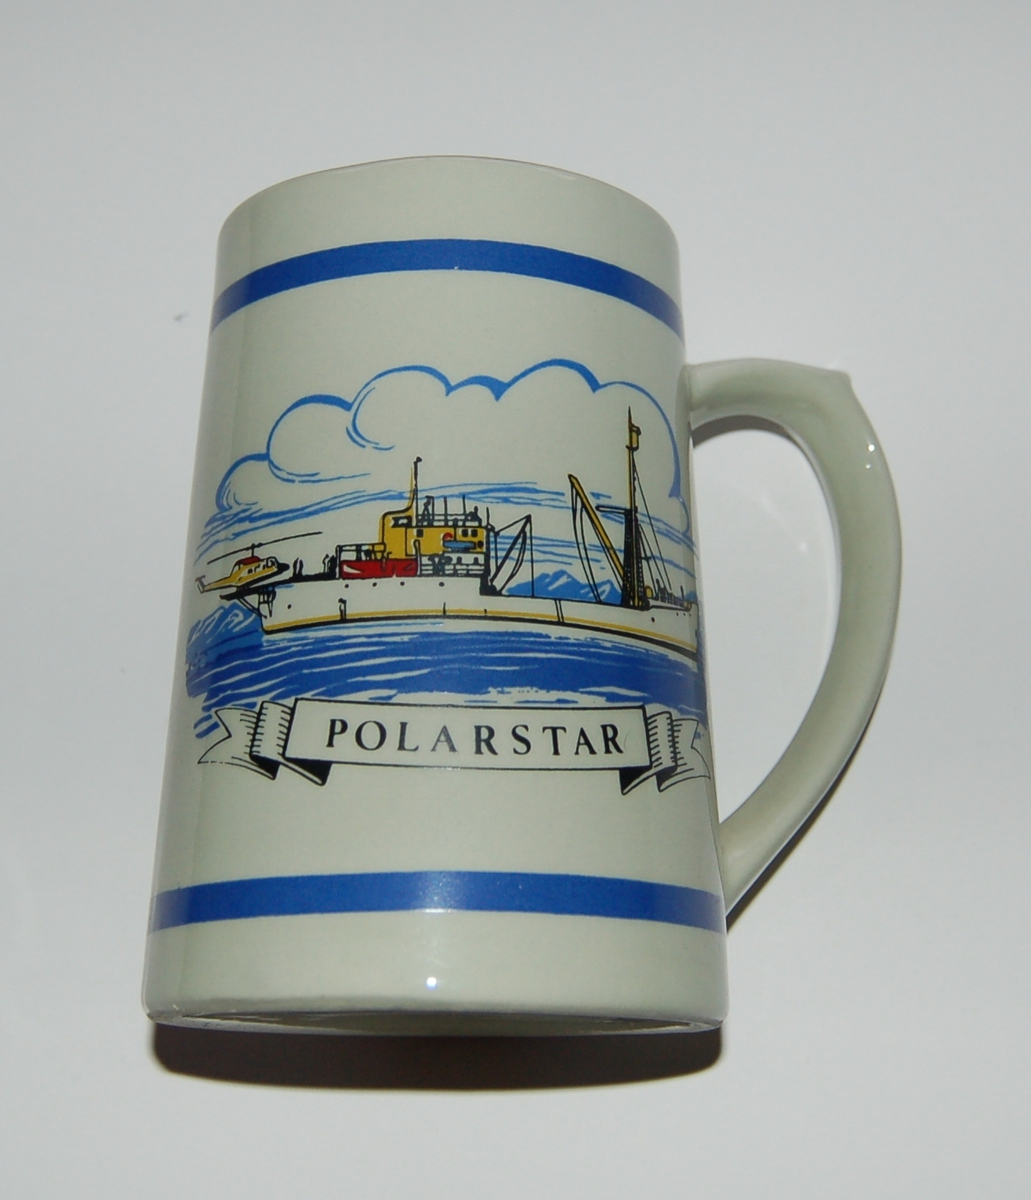 "Utsmykka prismeforma suvenirkrus i glassert porselen. Motiv: M/S ""Polarstar"". Norsk Flagg - Rederiflagg. Tekst: Polarstar"